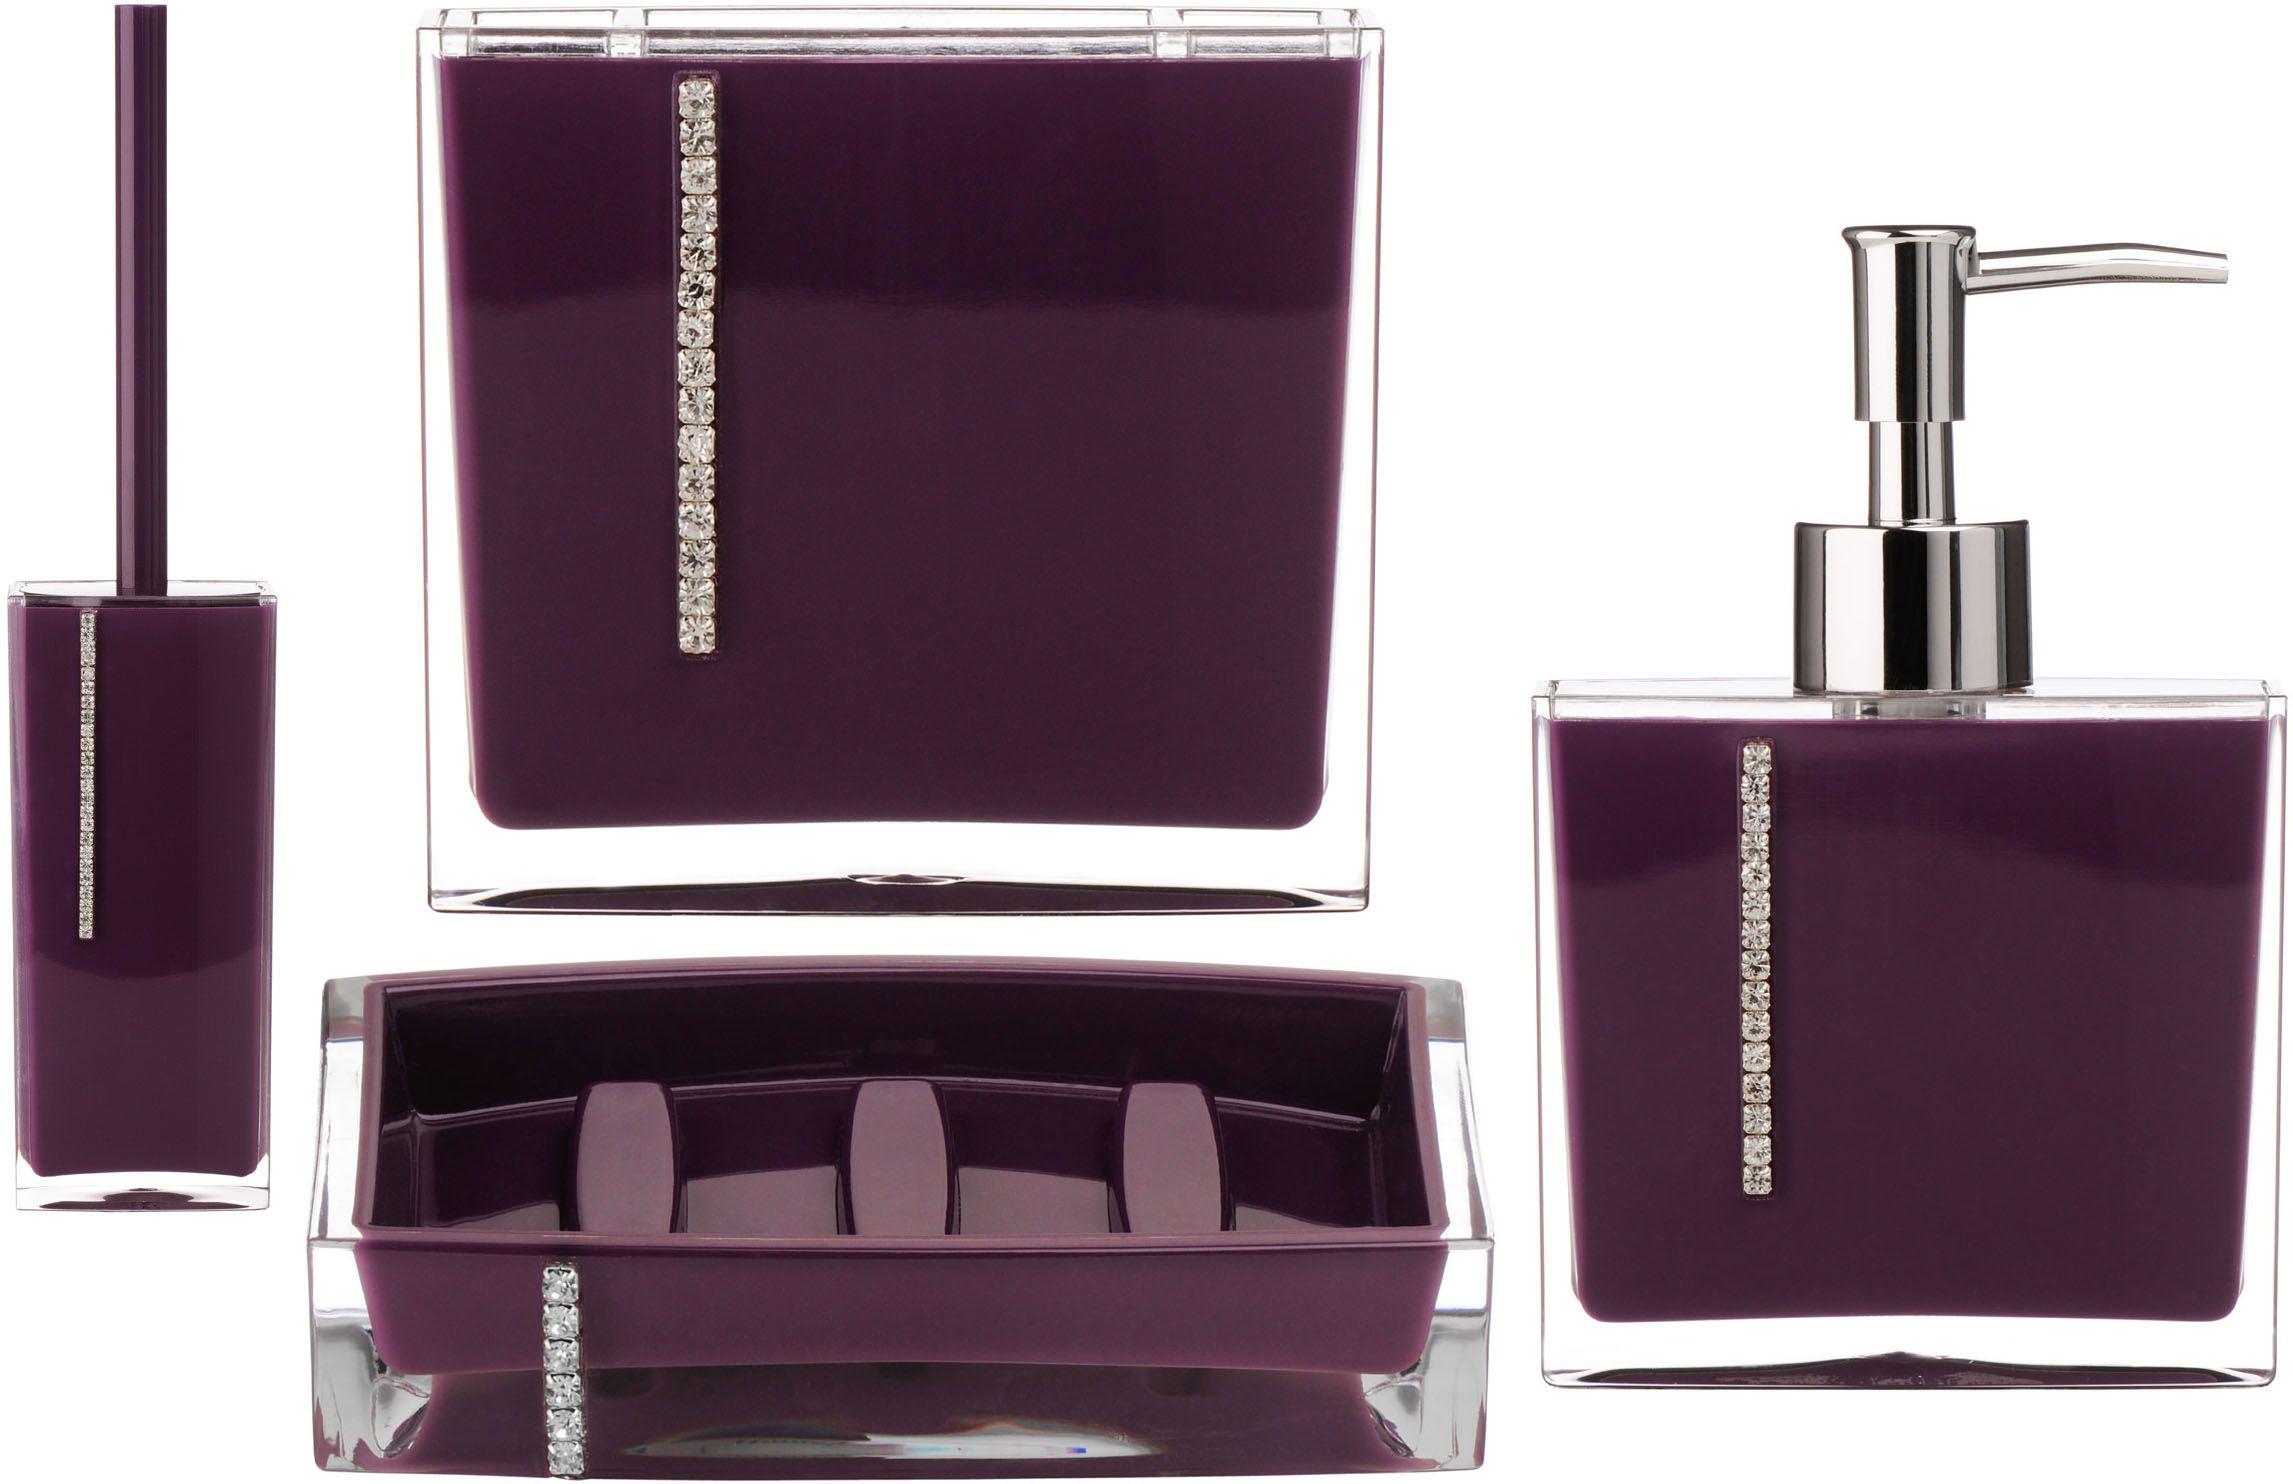 Best Photo Gallery For Website  Elegant Purple Bathroom Accessories of Photos Shopbaby Pinterest Photos Accessories and Bathroom